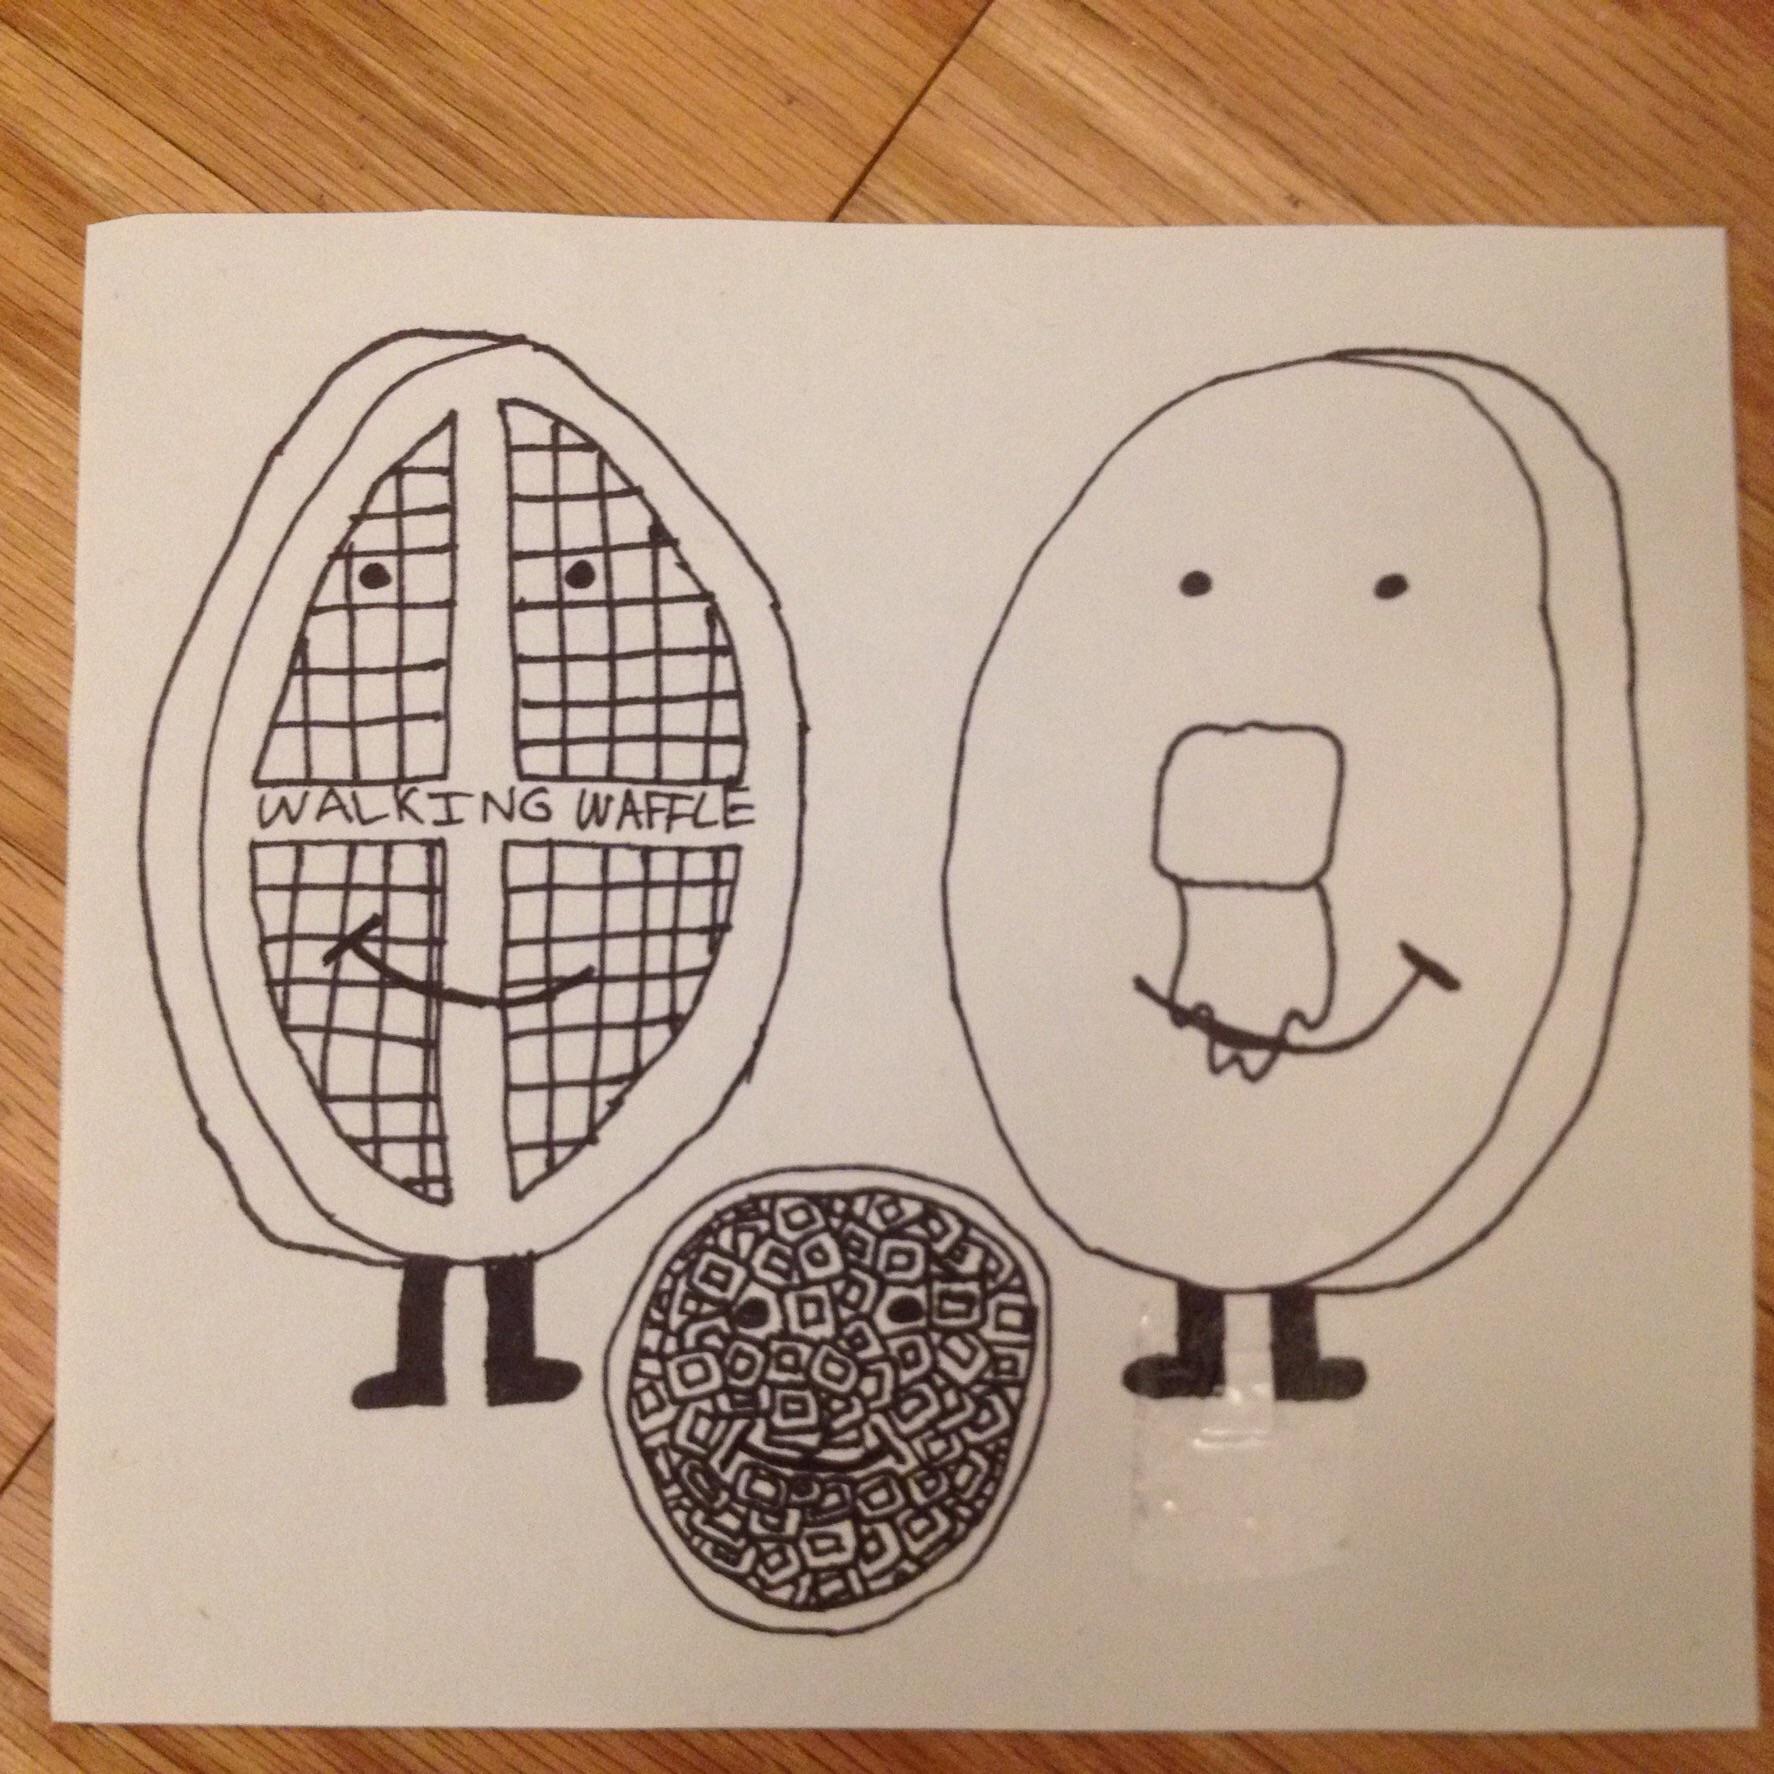 A Doodle of Walking Waffle and Pancake Pal!